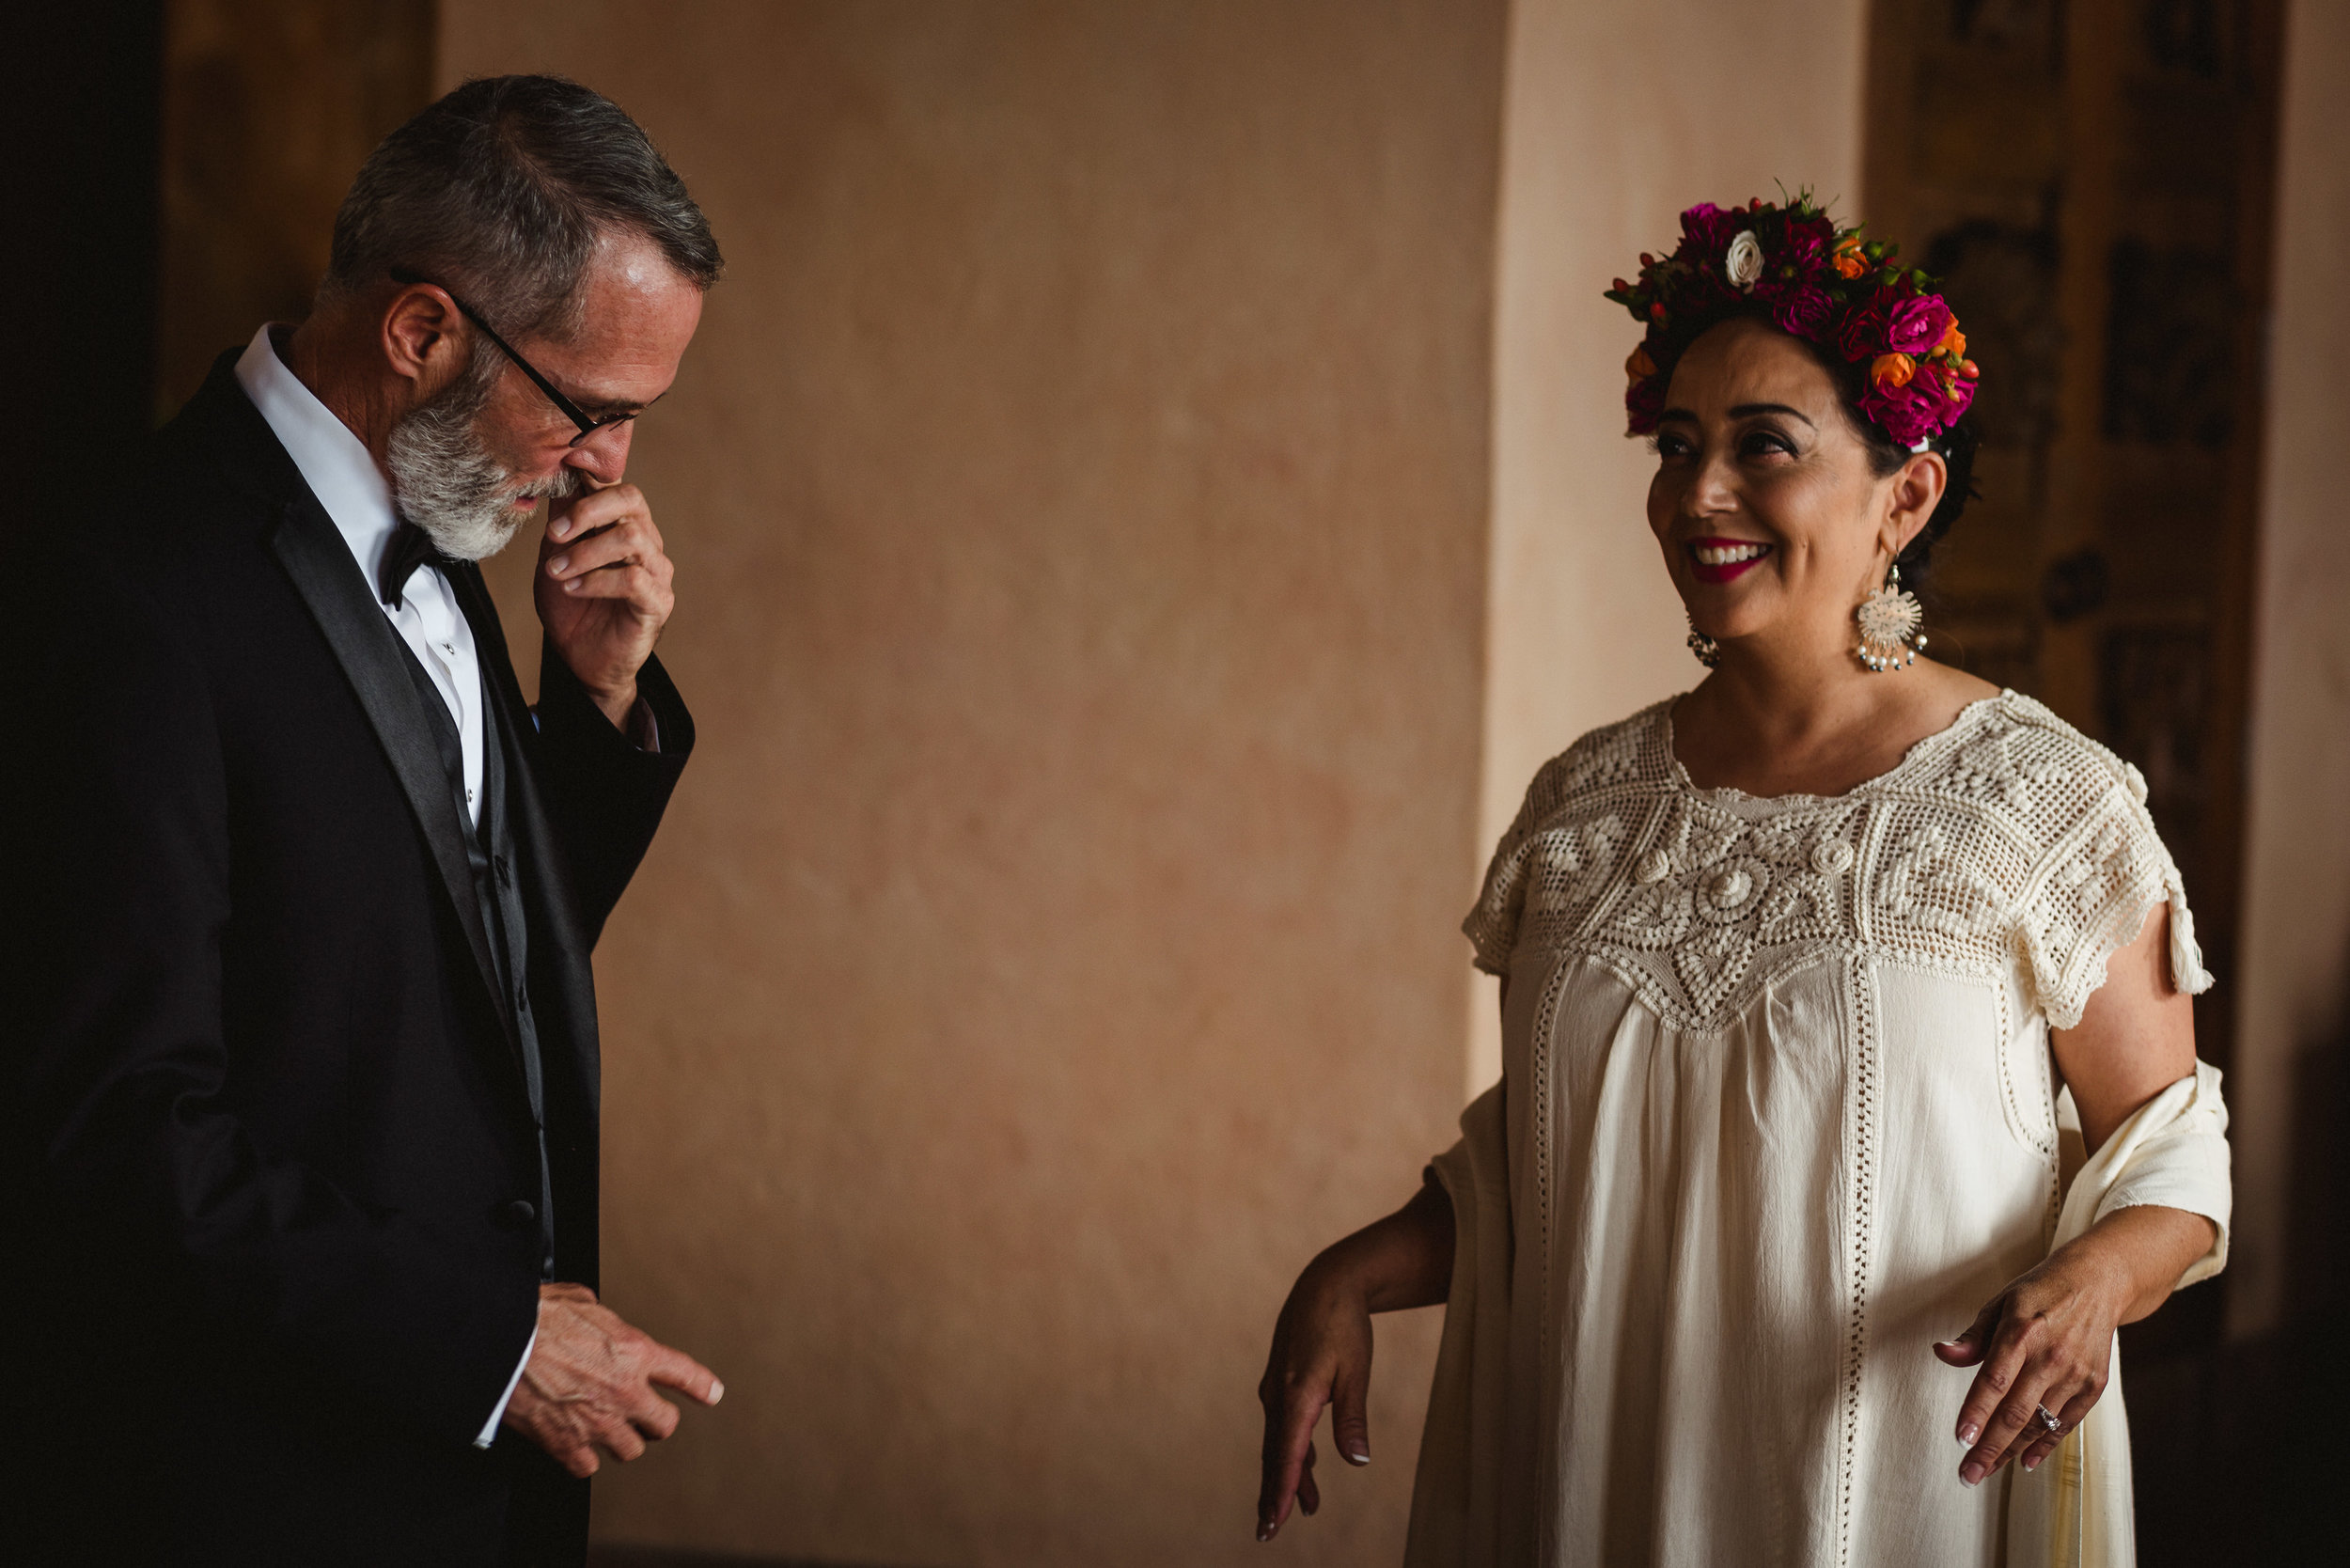 MaurizioSolisBroca-casa-carino-san-miguel-de-allende-wedding-32.jpg